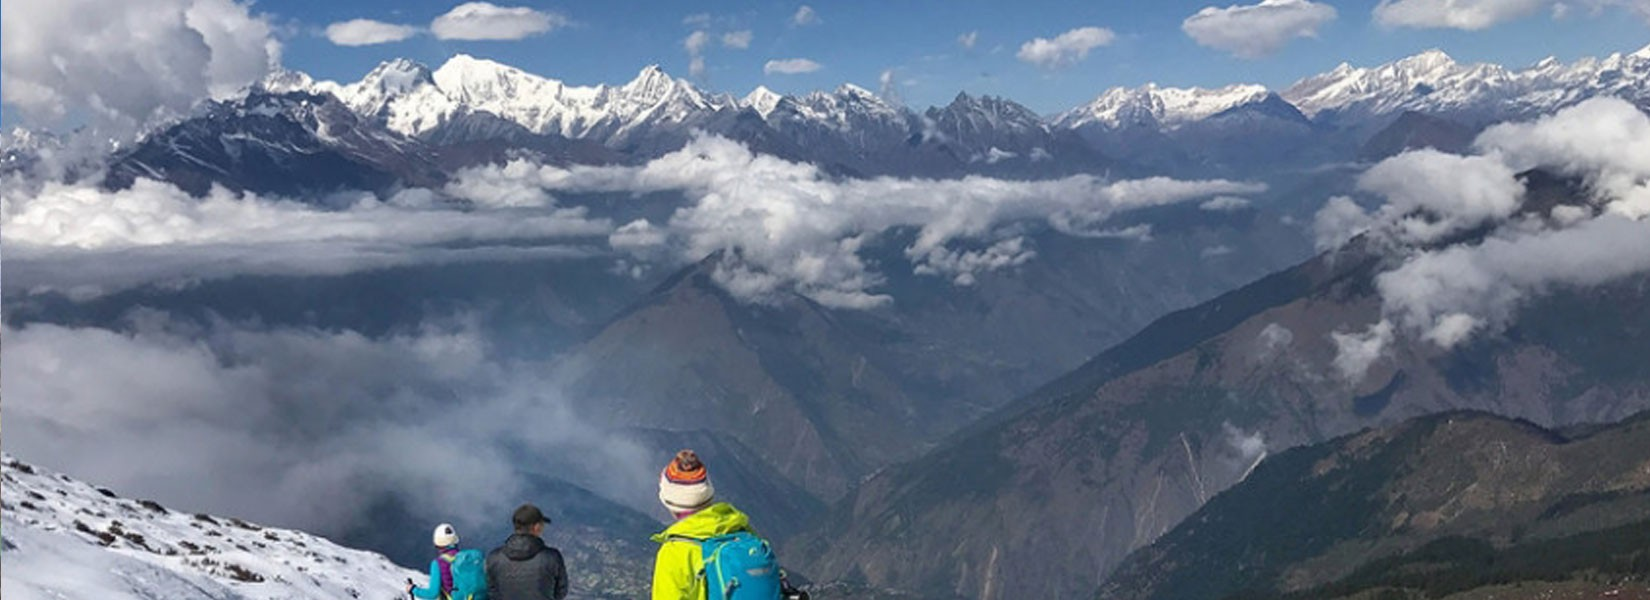 Nepal Far West Himalaya Trekking